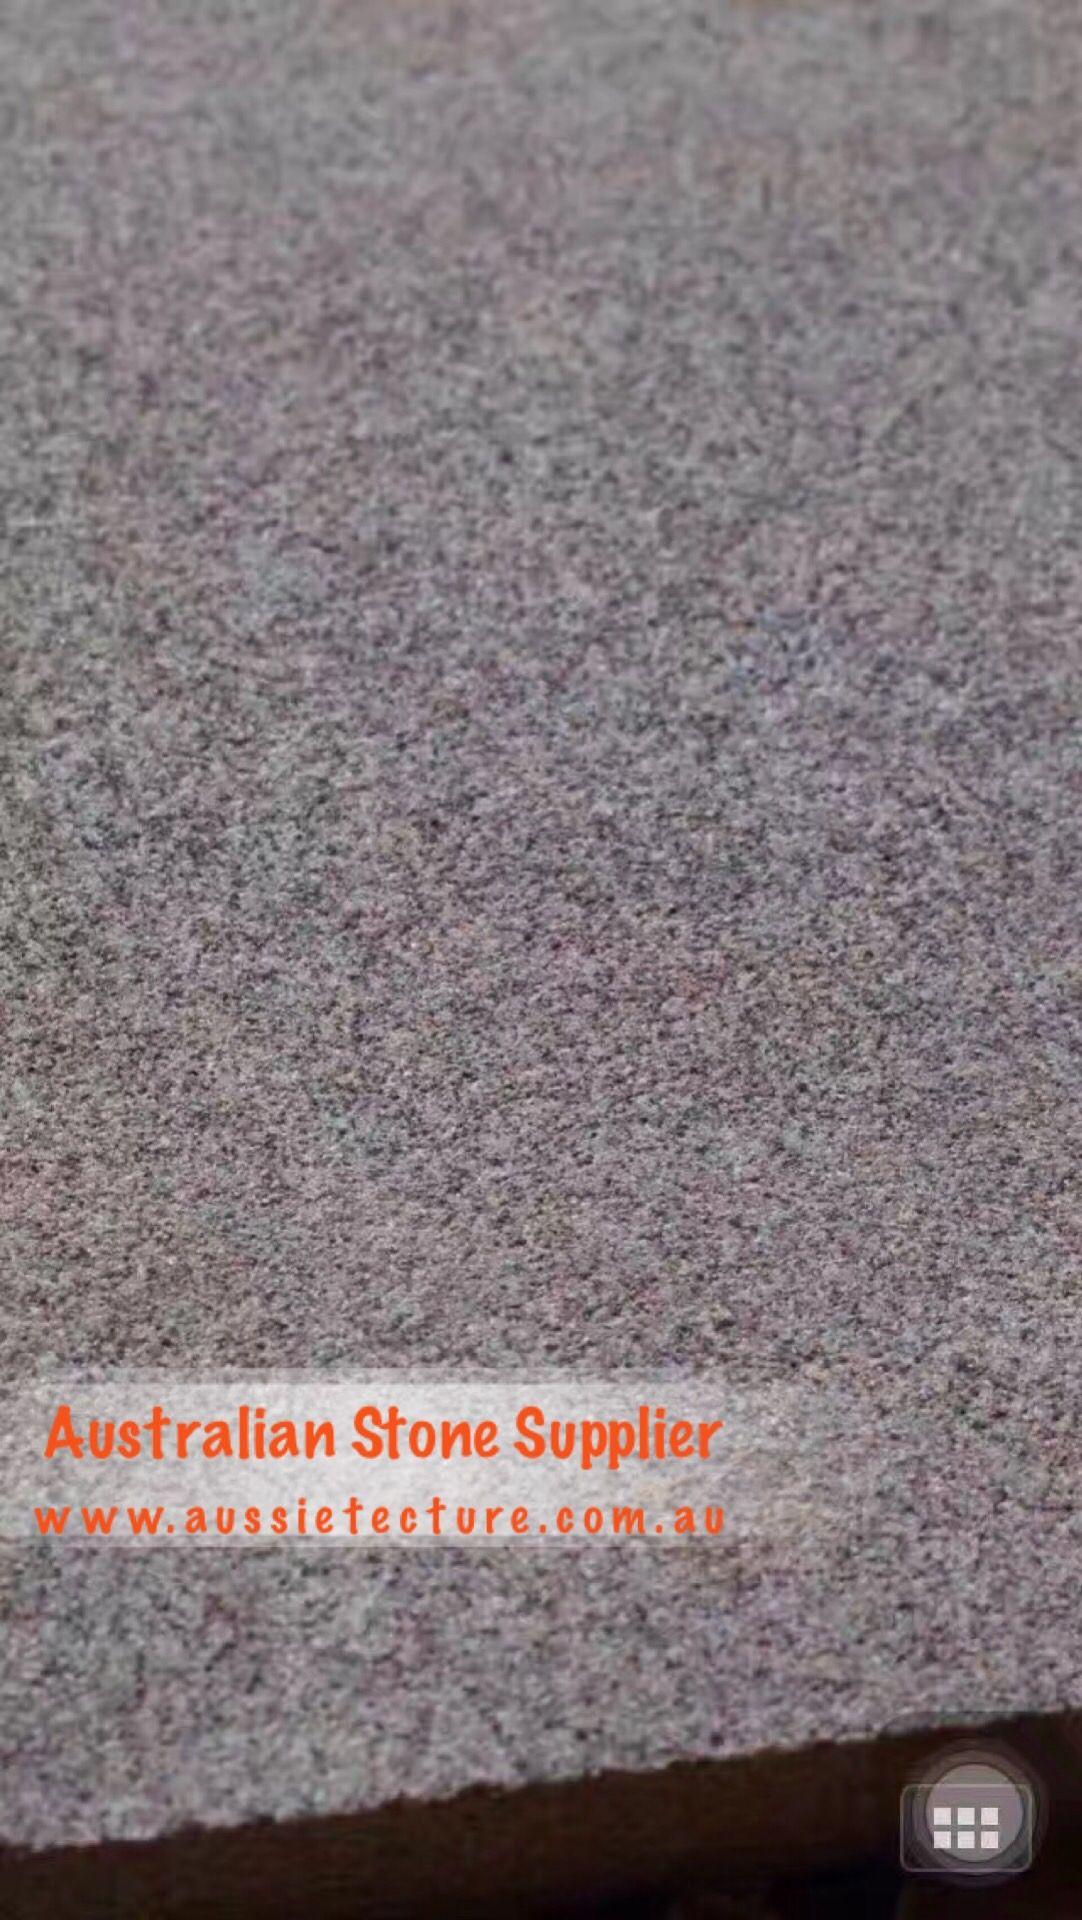 Australian Sandstone Cladding Sandstone Cladding Sandstone White Sandstone Sandstone Stonewall Natural Stone Wall Natural Stone Cladding Sandstone Paving